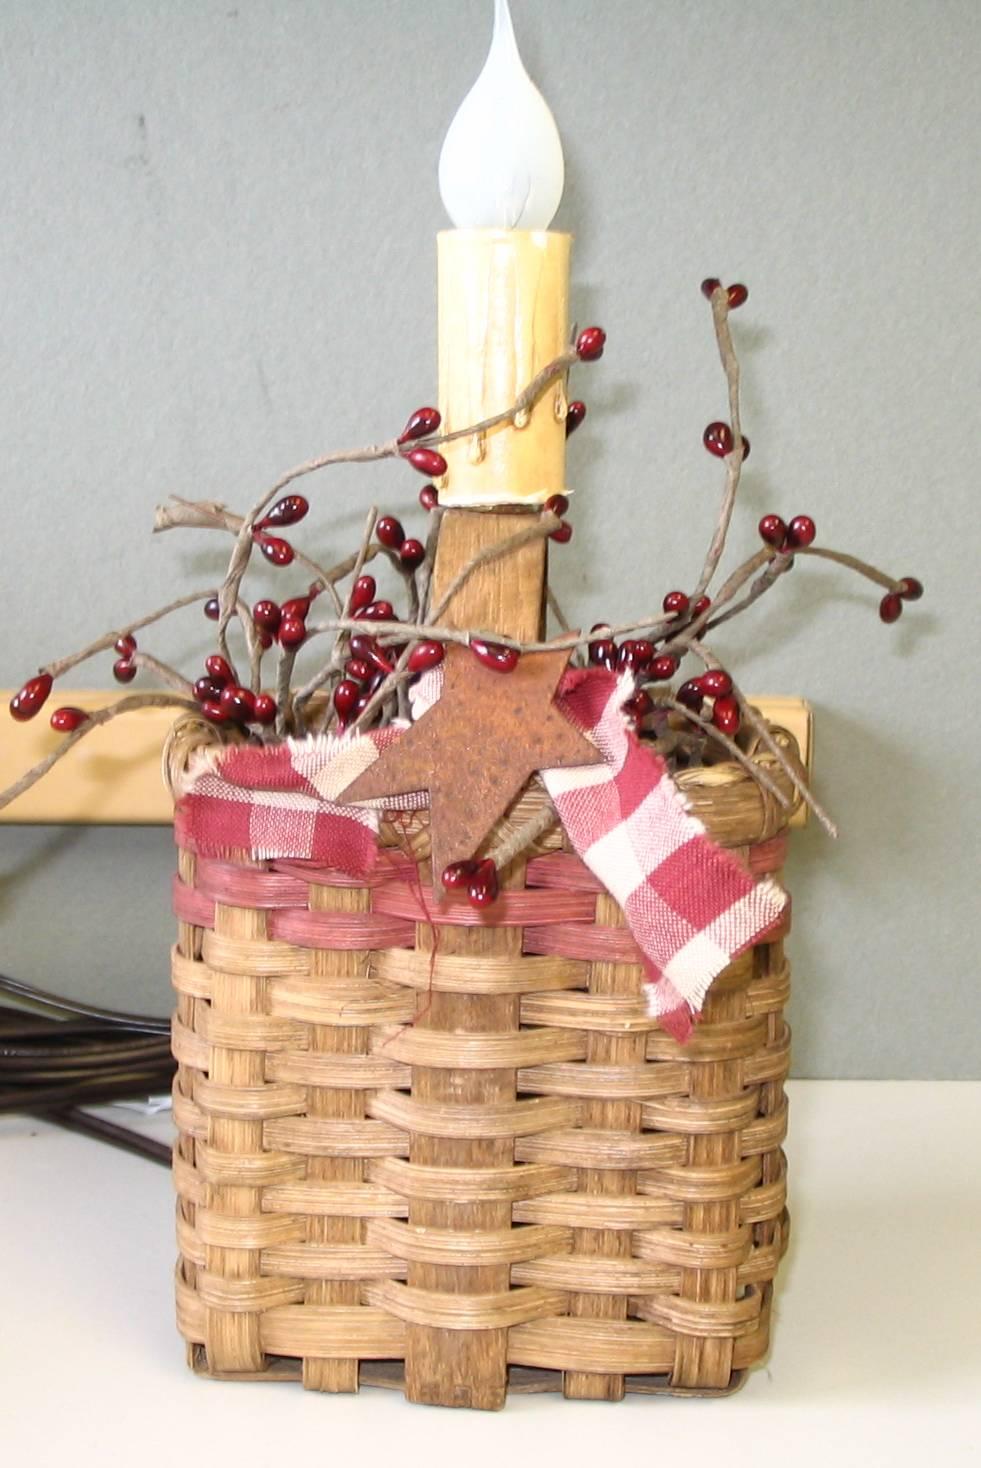 Berries & Star Basket Night Light